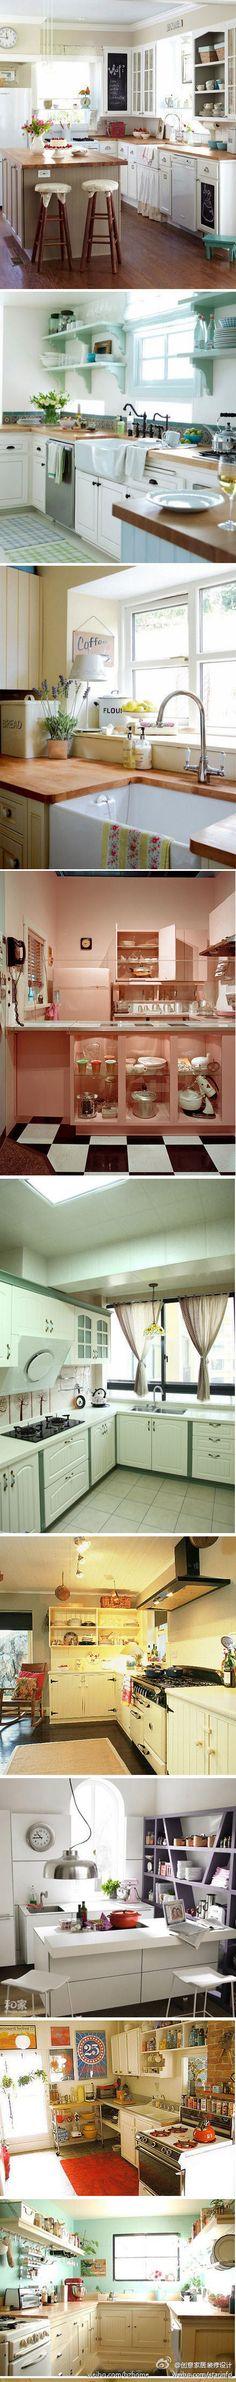 cozinhas...neat ideas, I like the acclectic kitchen